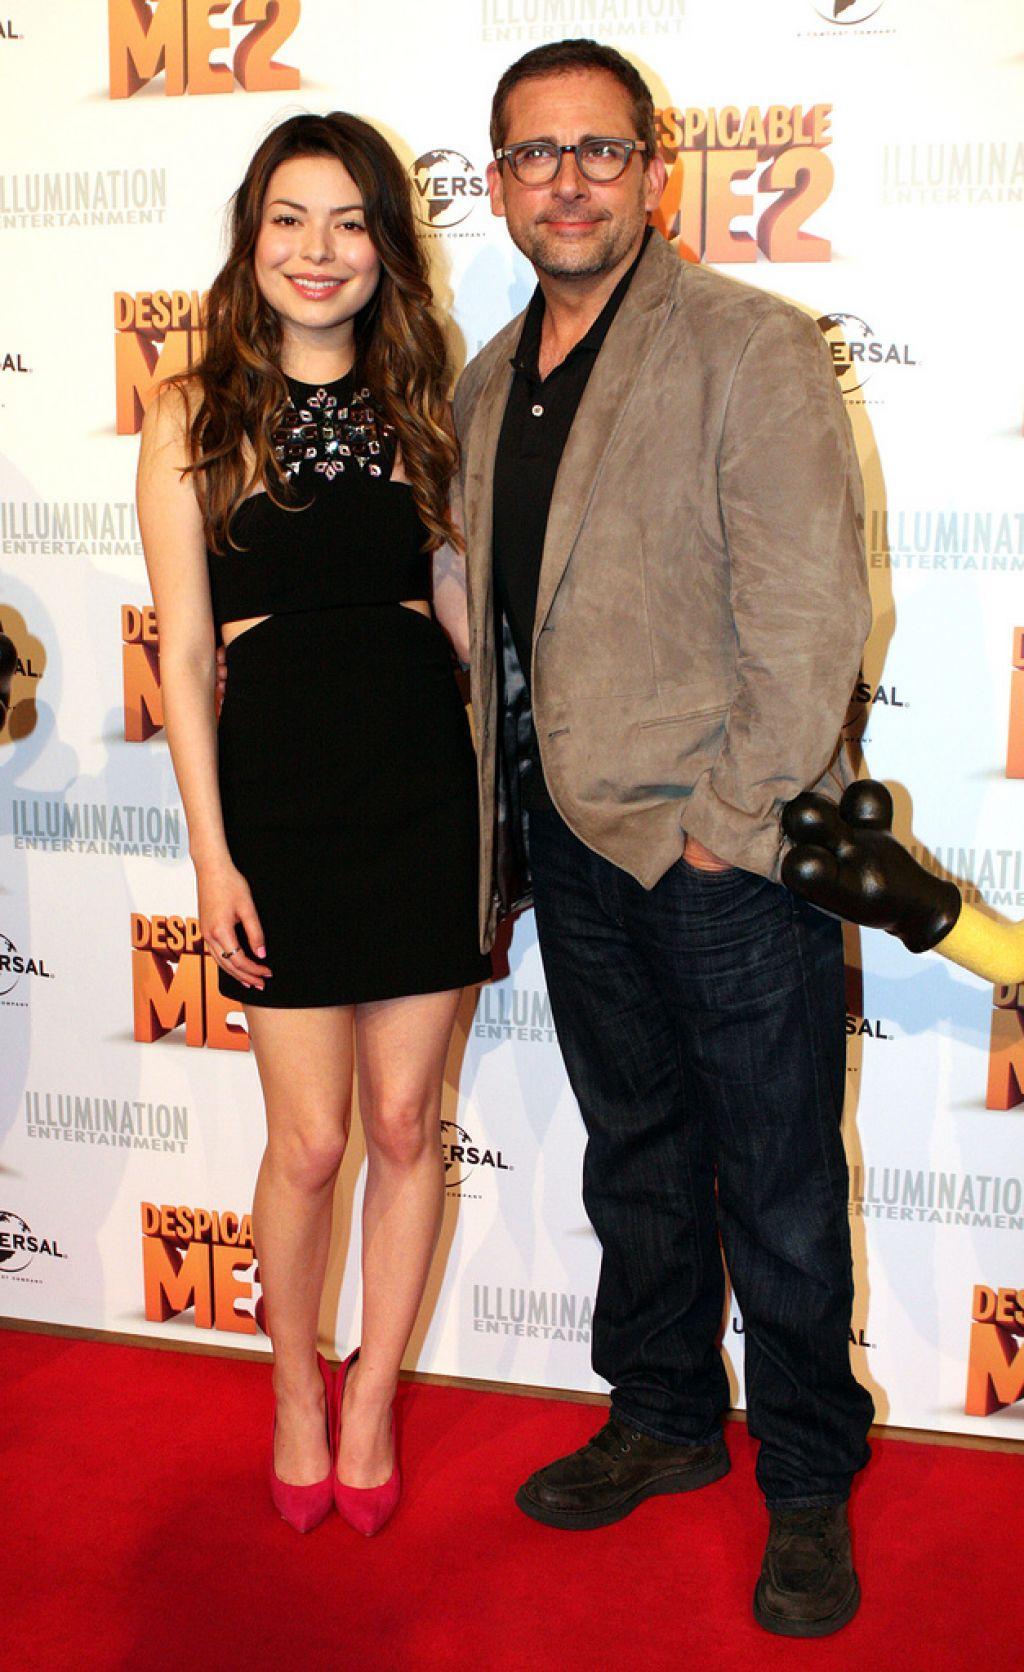 despicable me1 Miranda Cosgrove and Steve Carell at Despicable Me 2 Australian Premiere